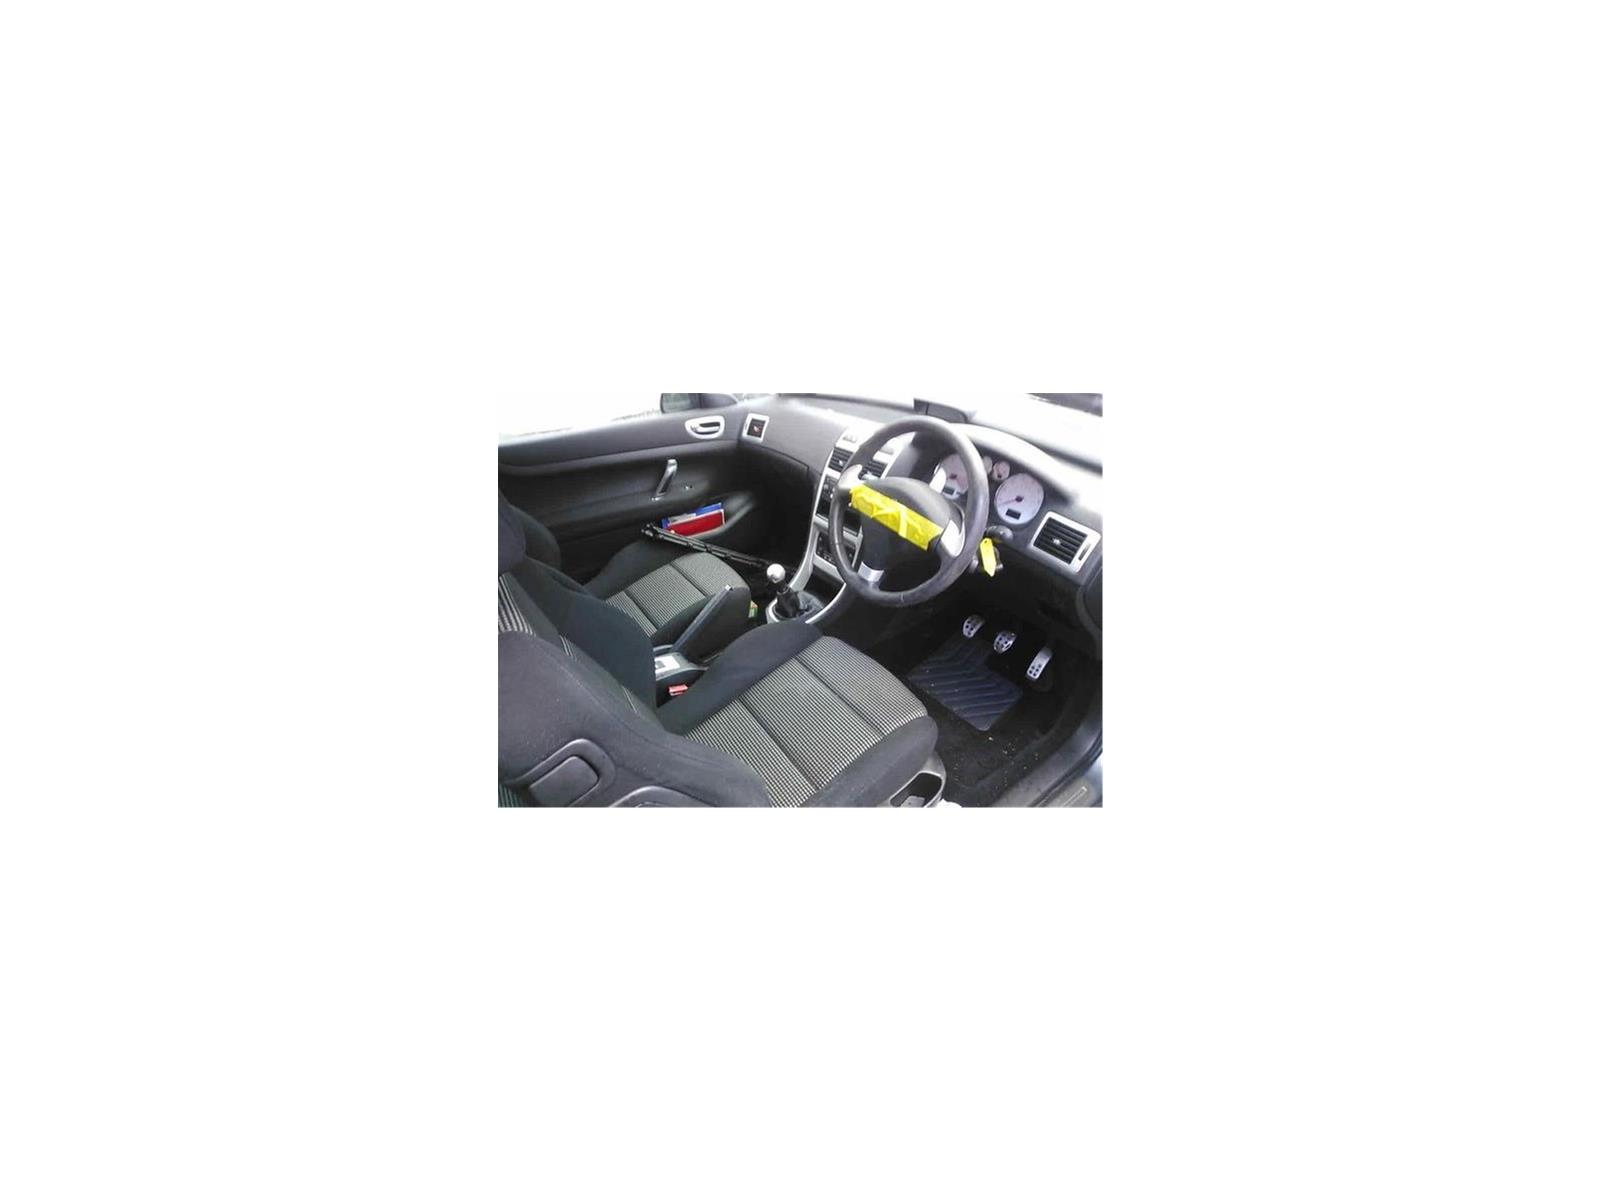 Peugeot 307 2005 To 2008 Fuse Box Petrol Manual For Sale From Ferrari